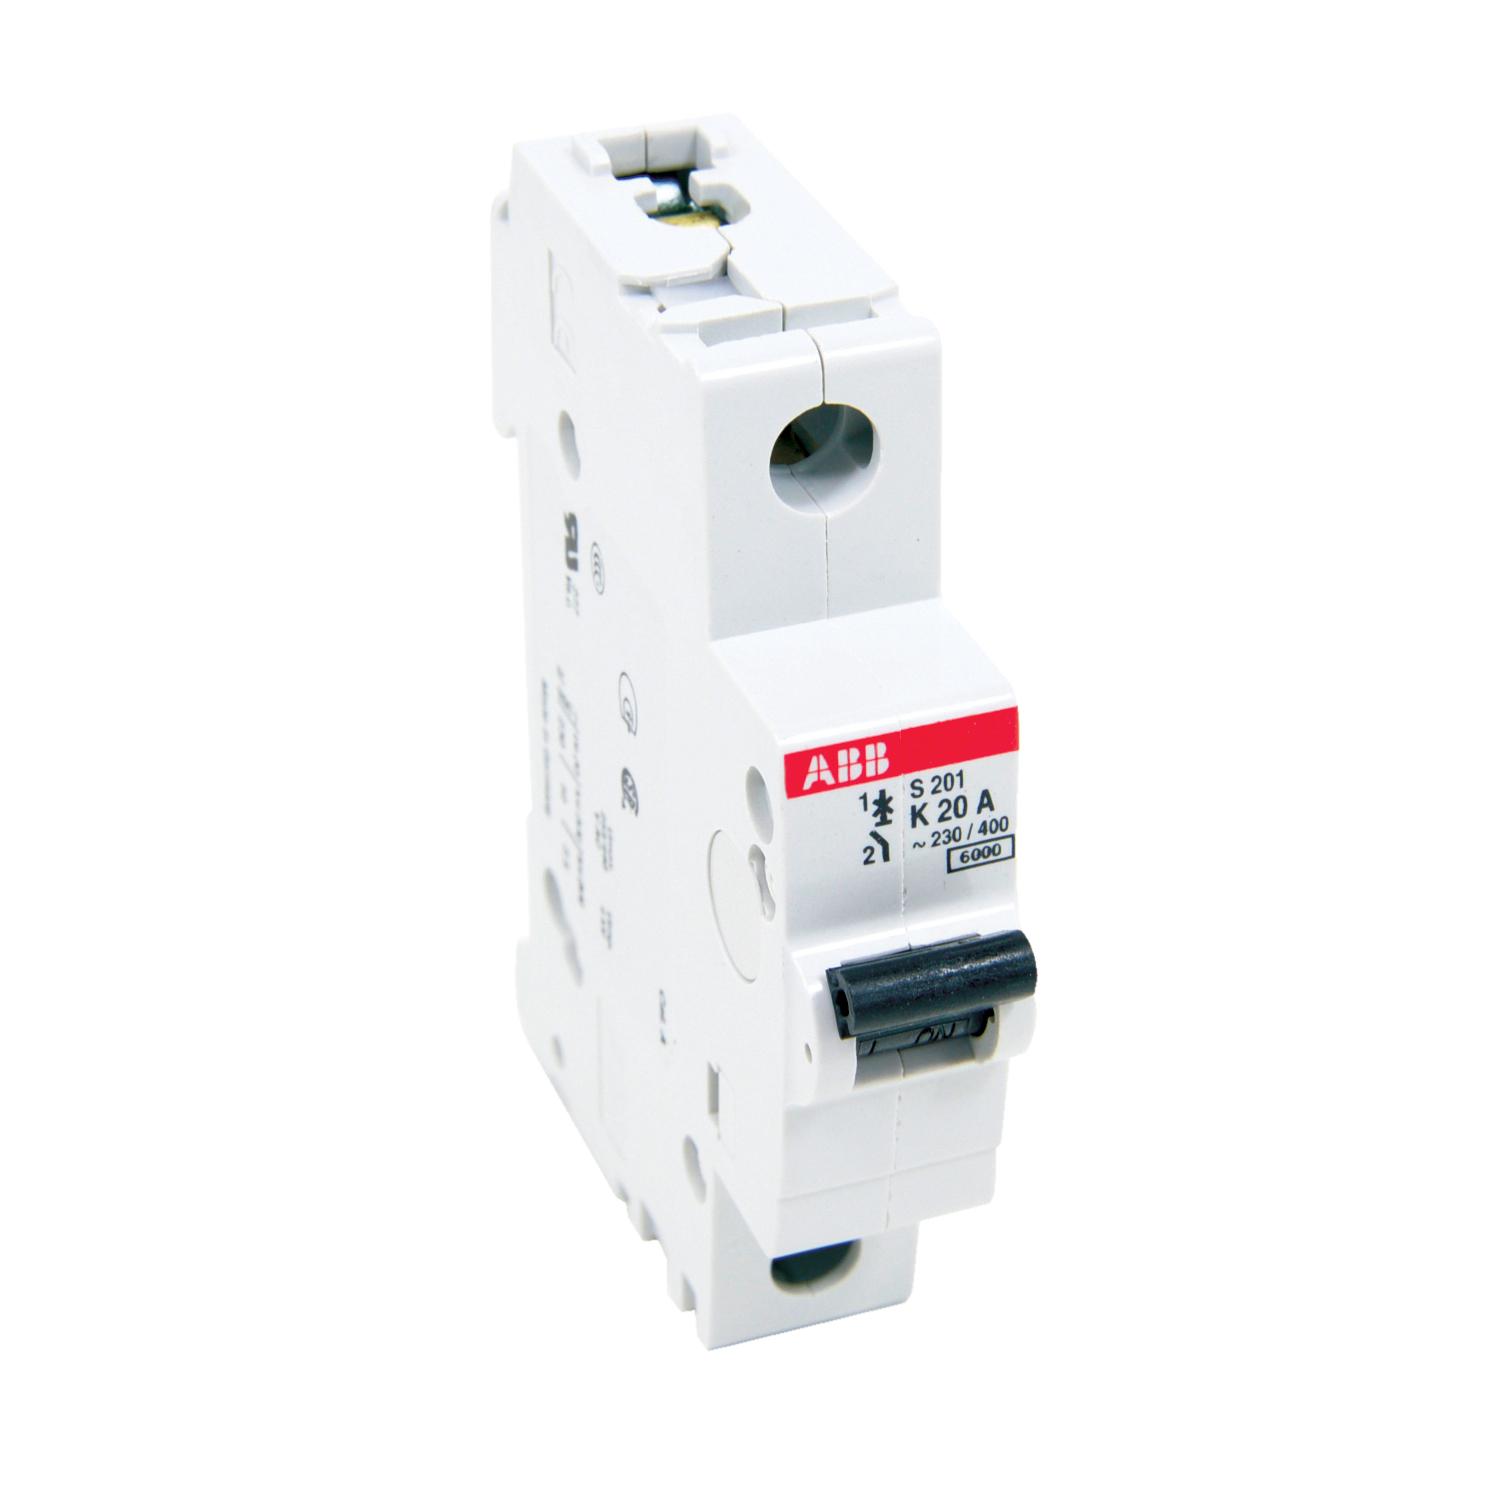 ABB,S201-K20,ABB S200 Miniature Circuit Breaker, 277/480 VAC, 20 A, 6 kA Interrupt, 1 Pole, Thermal Magnetic Trip